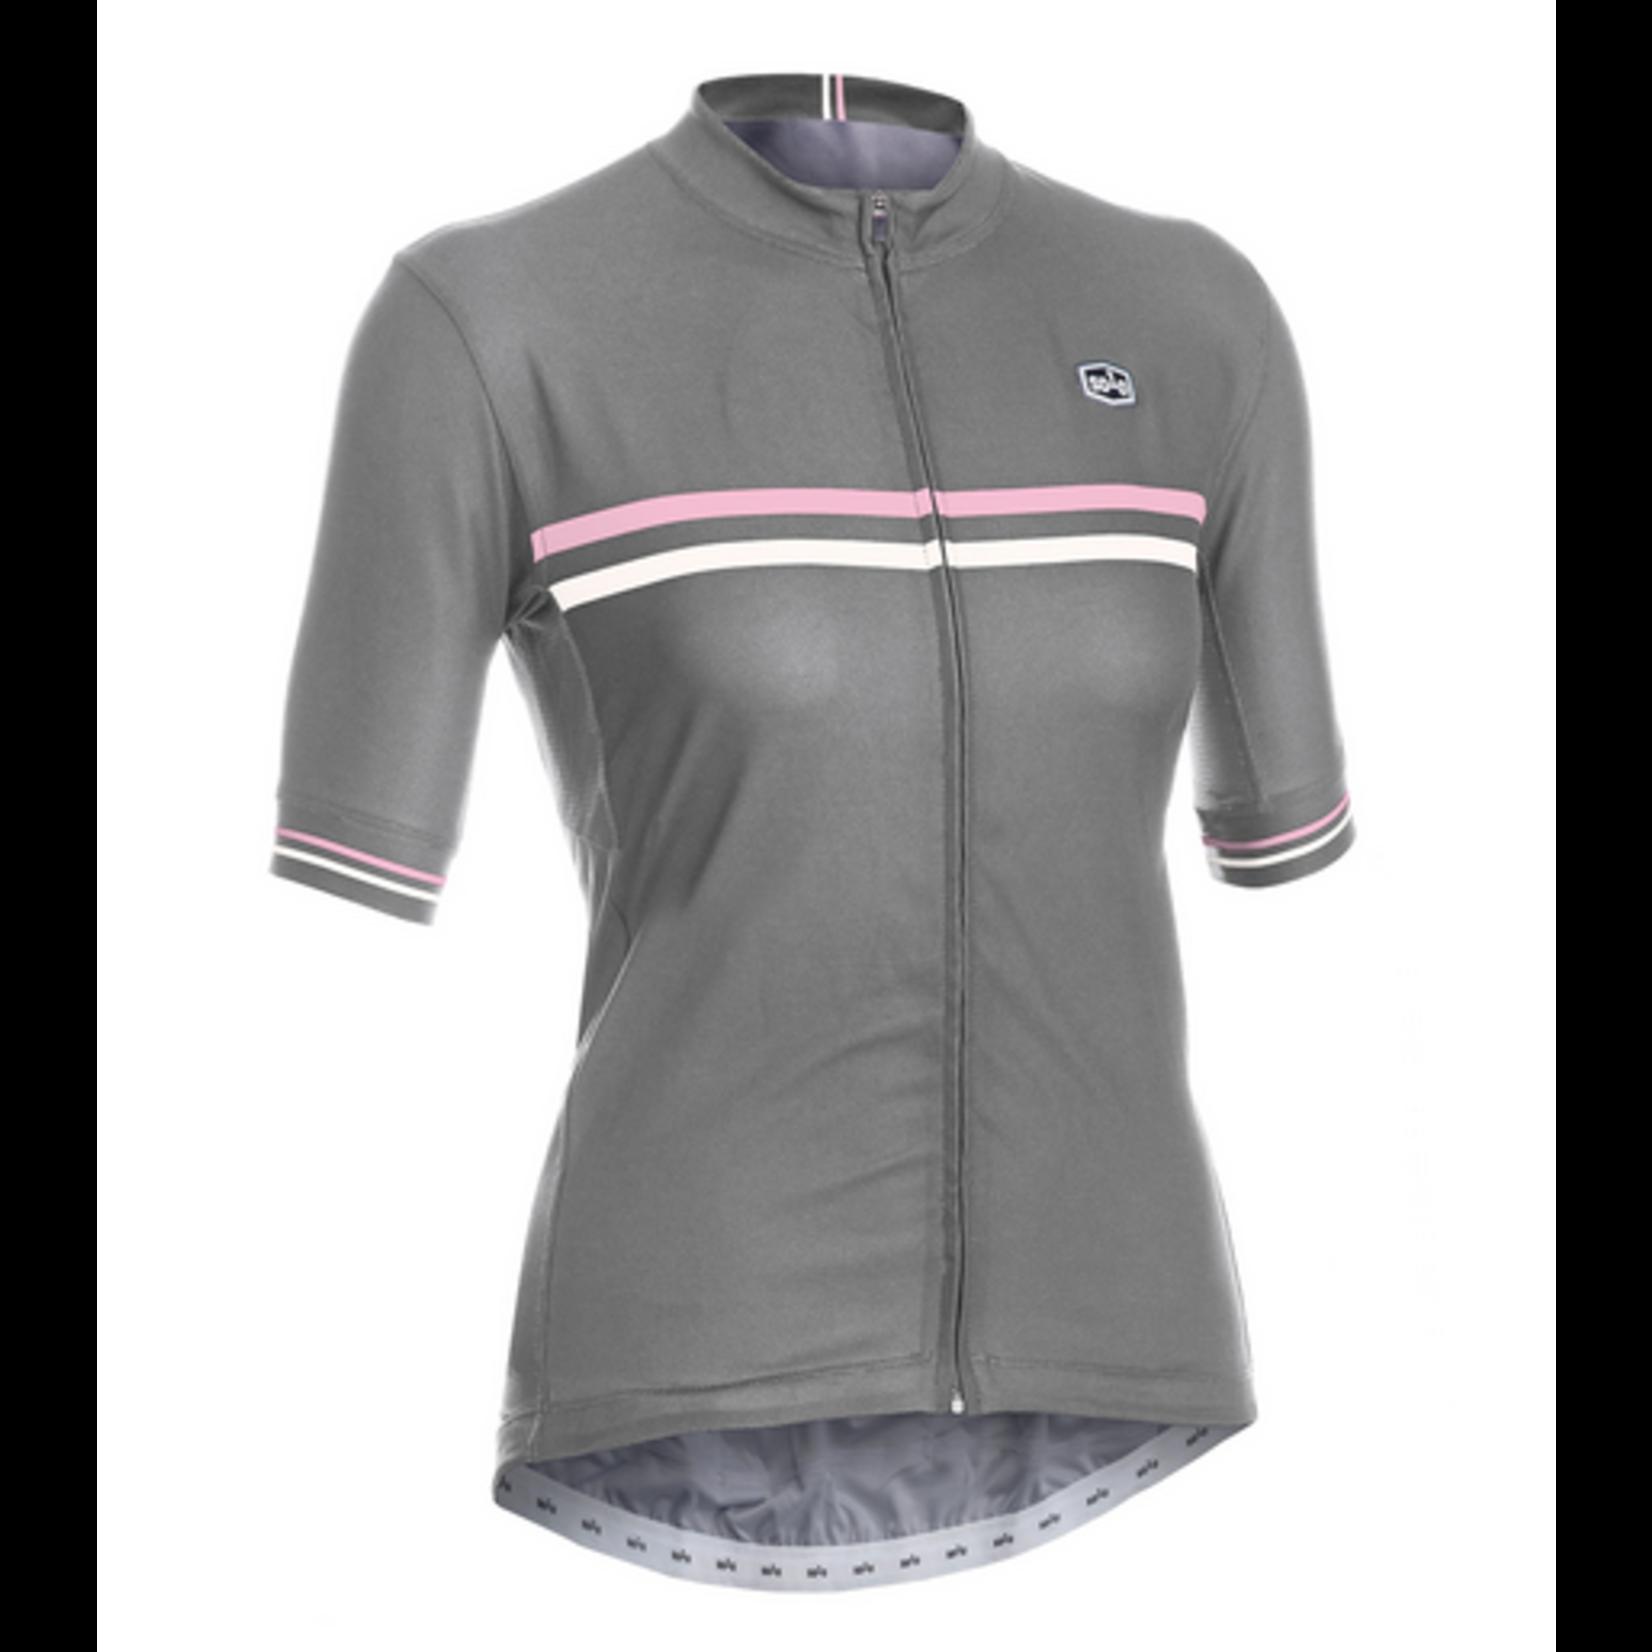 SOLO Solo Duo Woman Cycling Jersey Grey